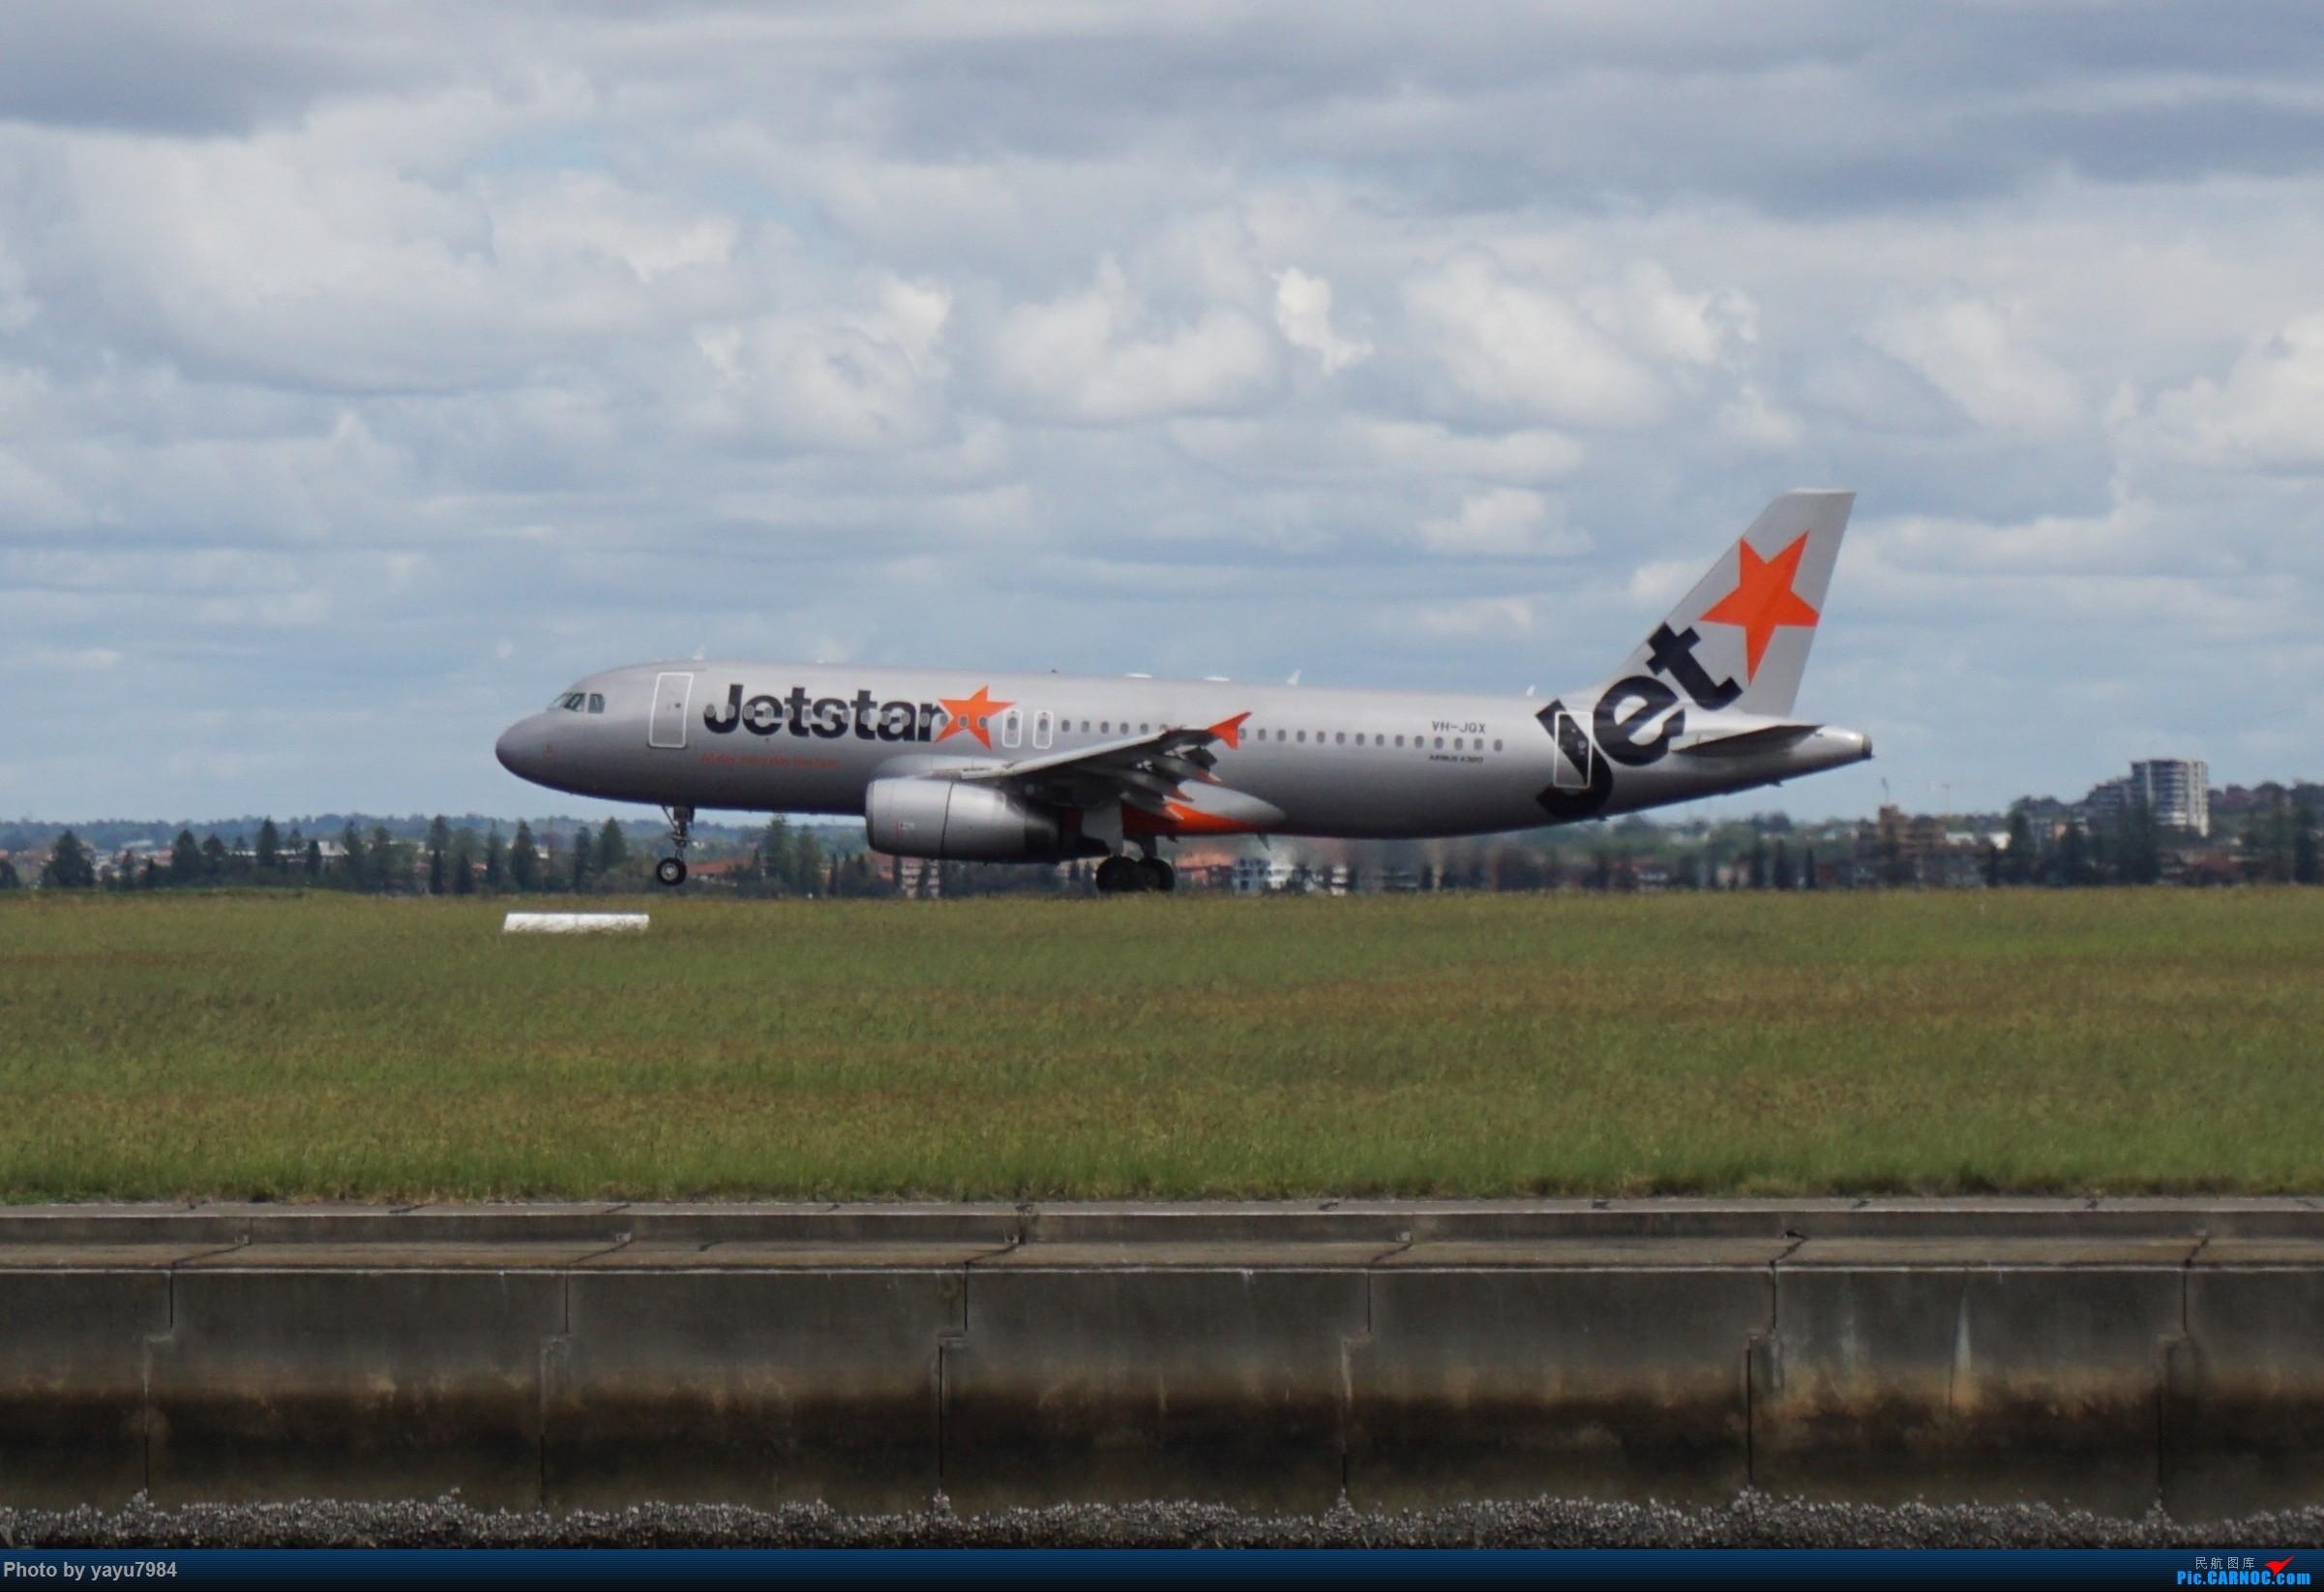 Re:[原创][SYD] 开帖分享一下16L/34R,以及07/25跑道周边的新拍机点位 AIRBUS A320-200 VH-JQX 澳大利亚悉尼金斯福德·史密斯机场